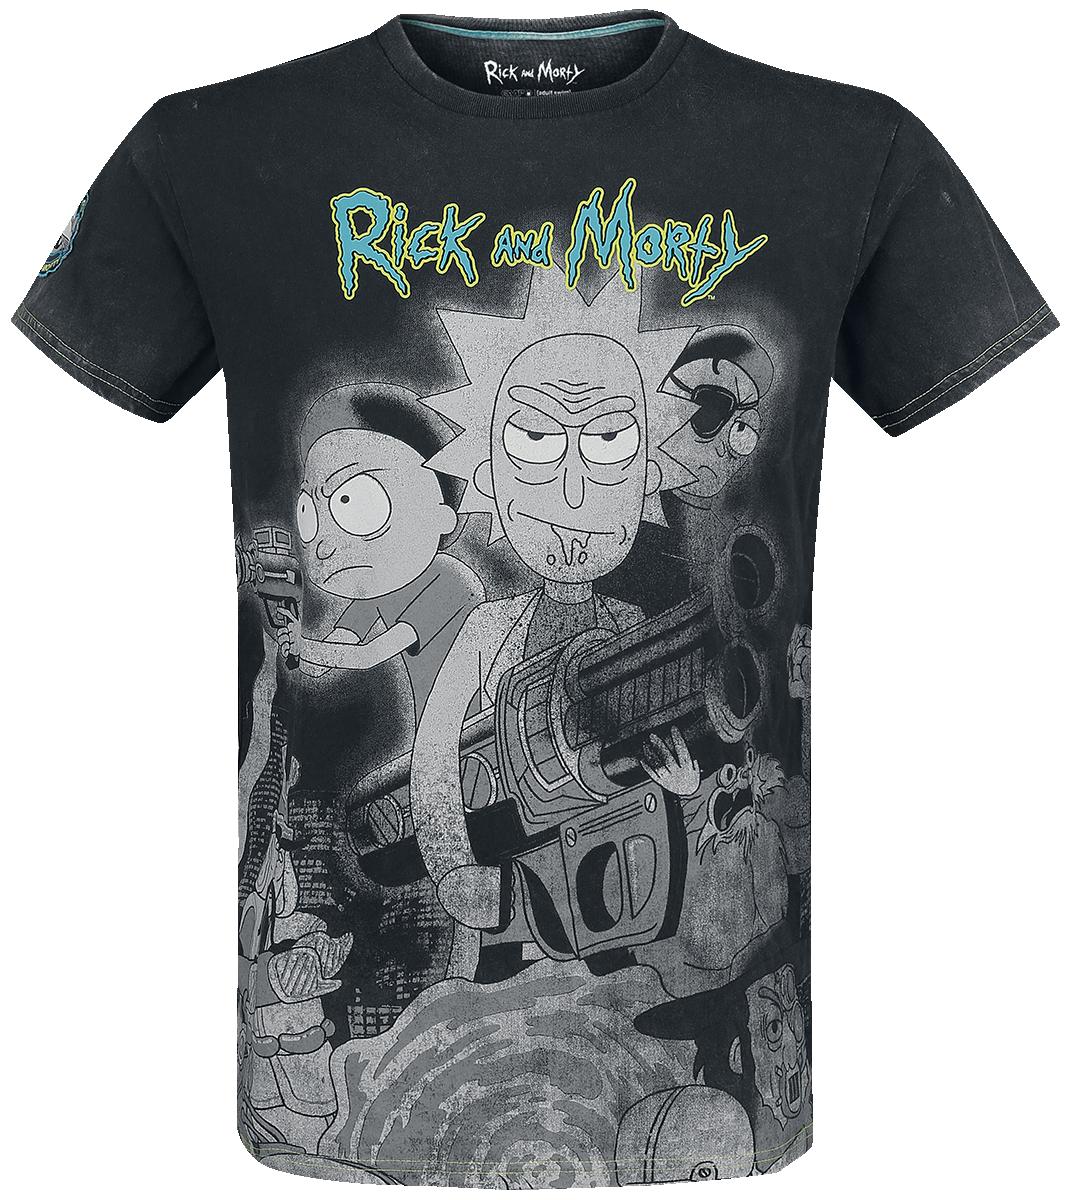 Rick And Morty - Rick and Morty Movie - T-Shirt - dark grey image